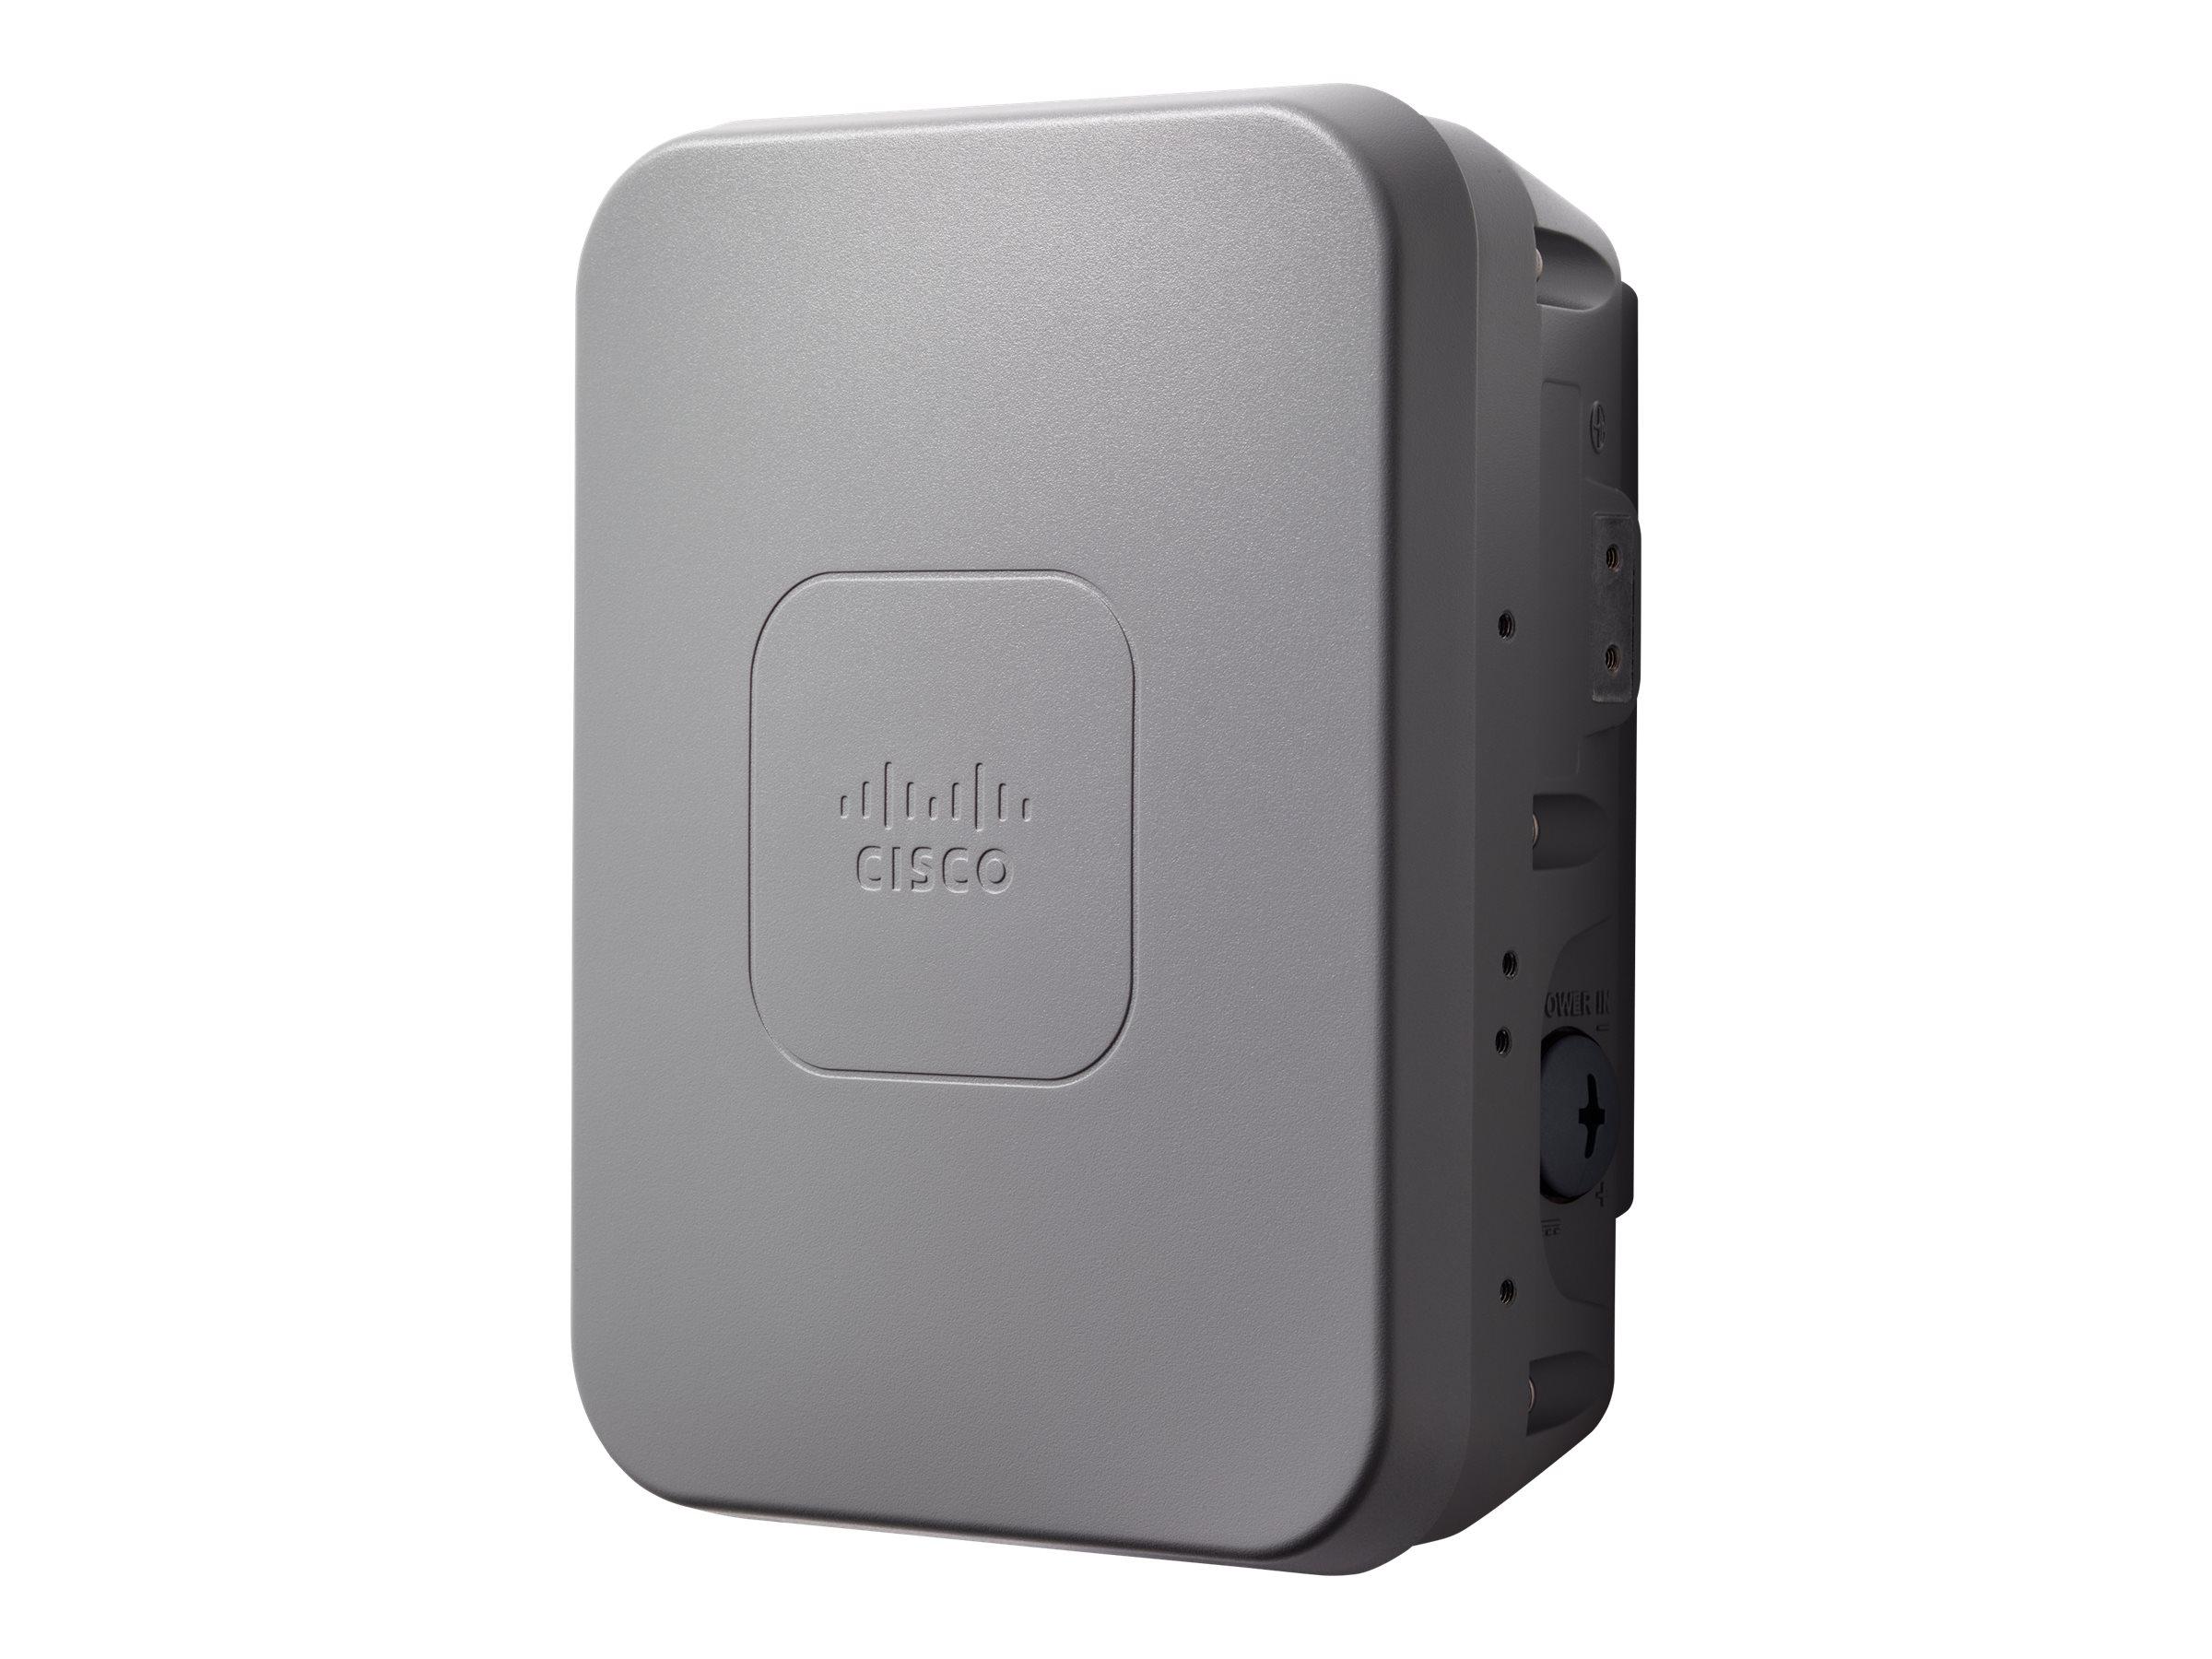 Cisco Aironet 1562I - Drahtlose Basisstation